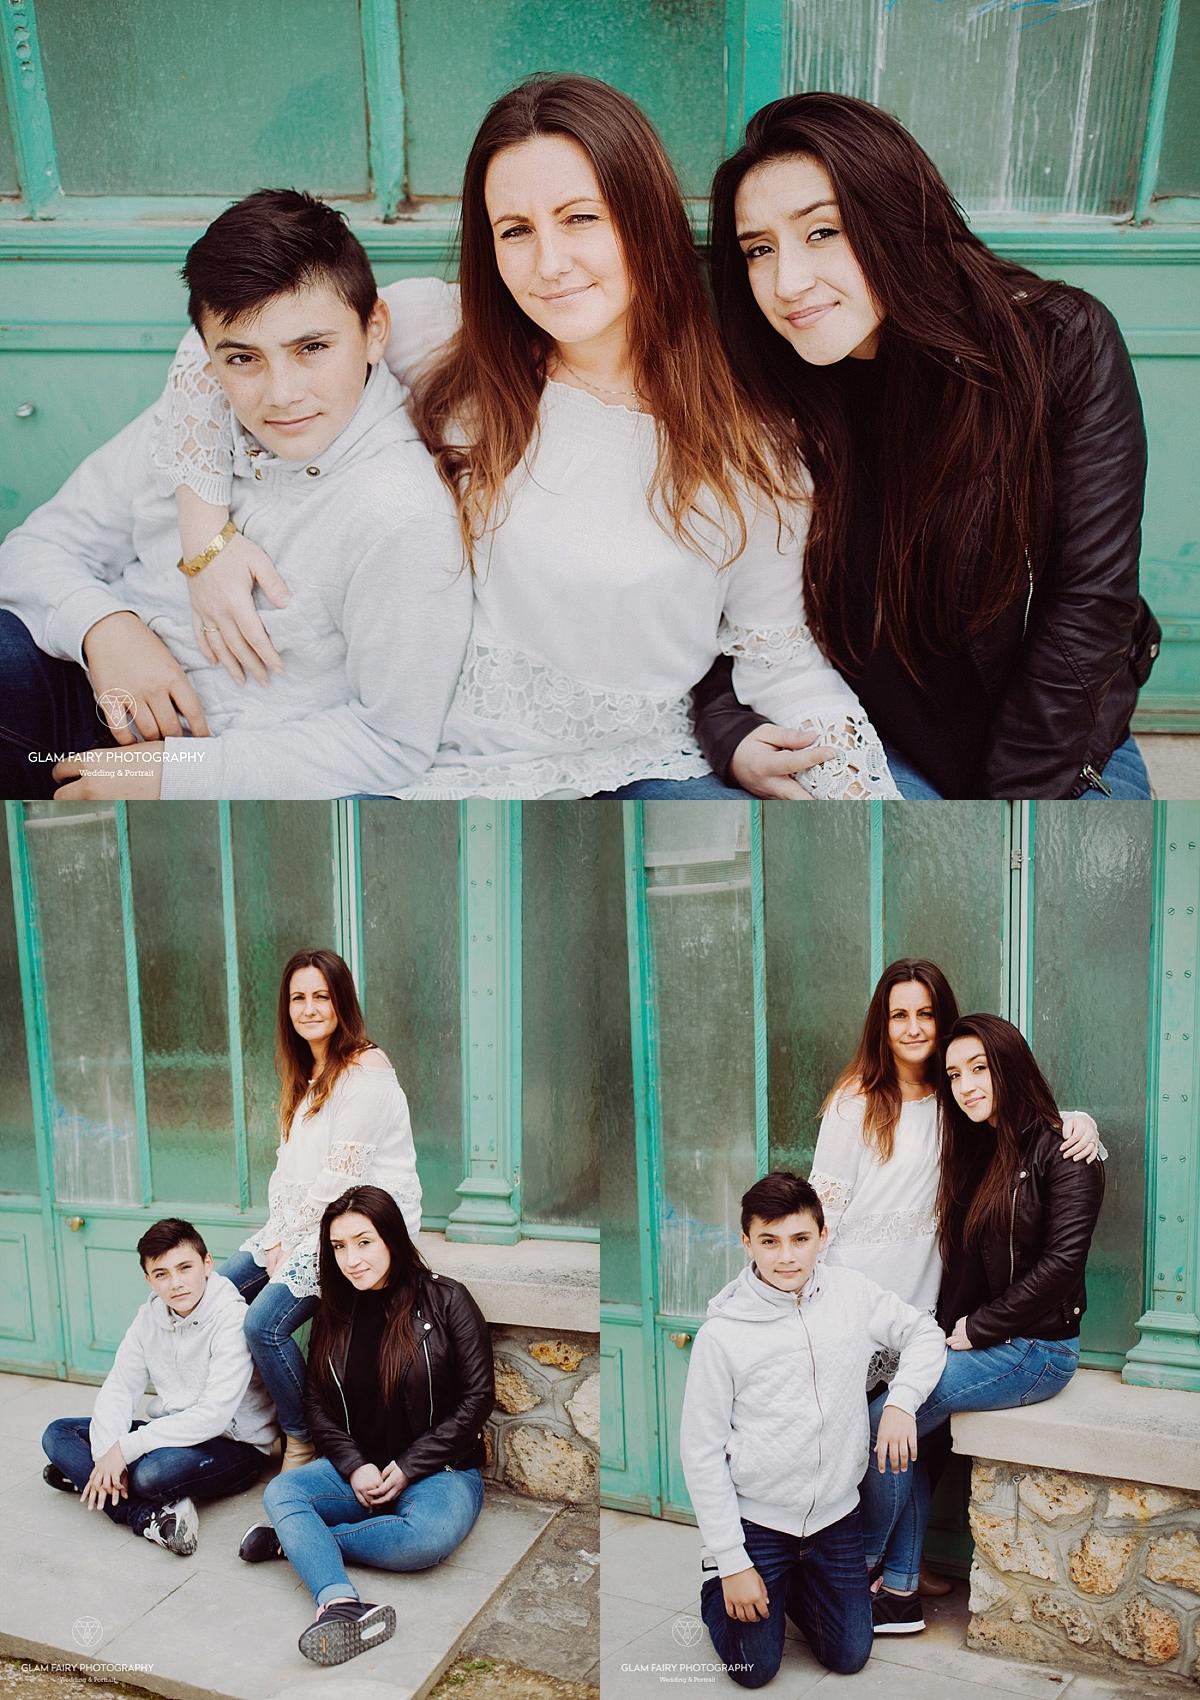 GlamFairyPhotography-seance-couple-famille-serres-auteuil-sonia_0019